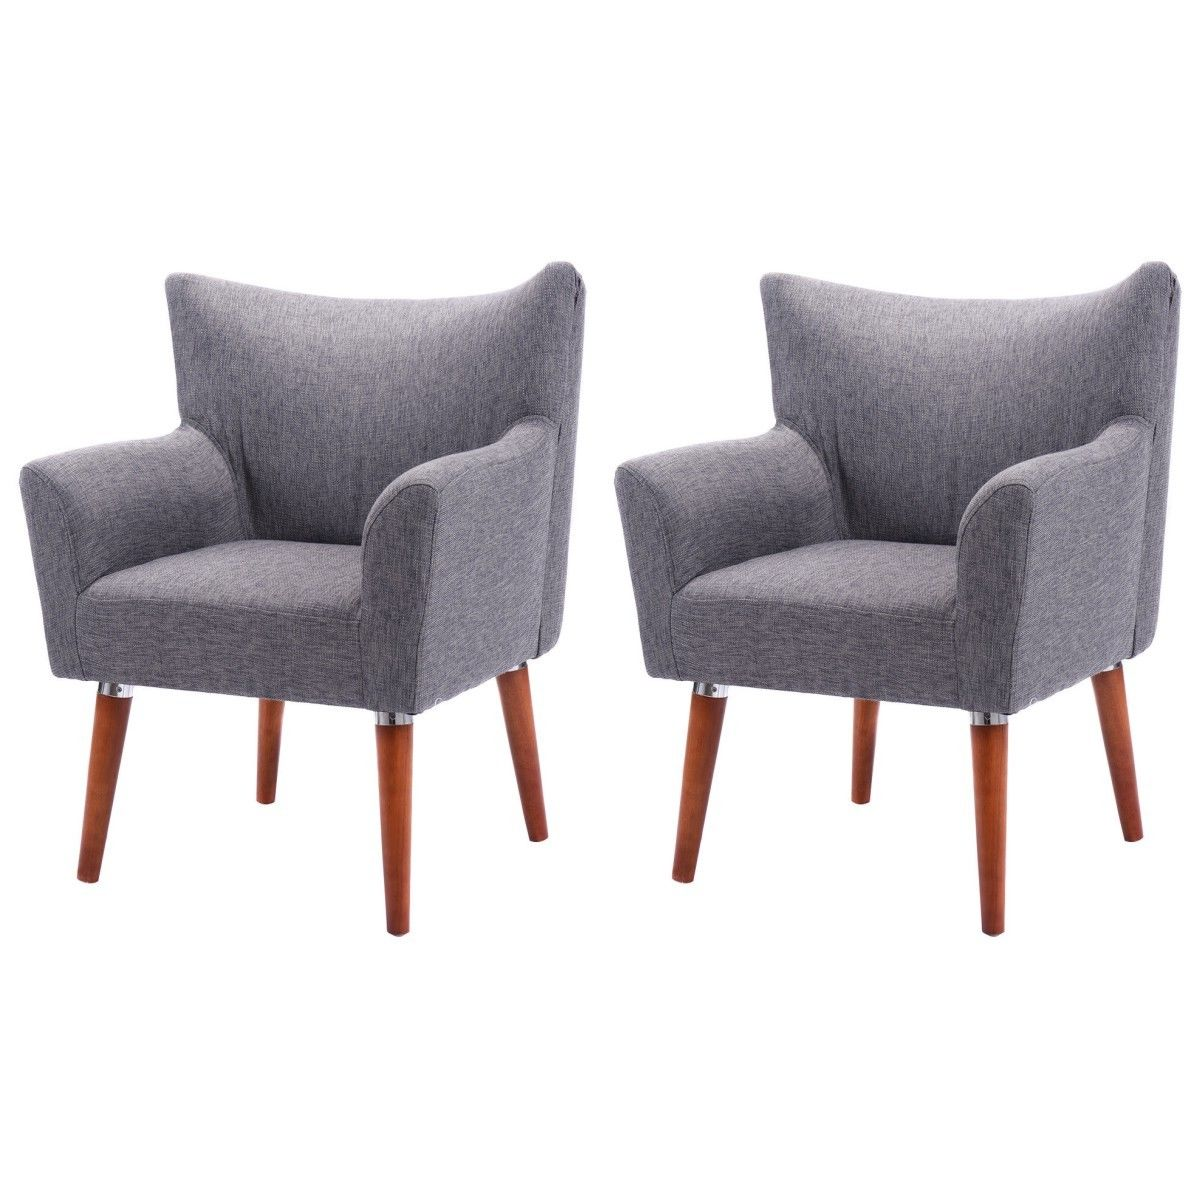 Single Sofa Chair Cover Bed Slat Holders Set Eponj Home постельное белье с рисунком